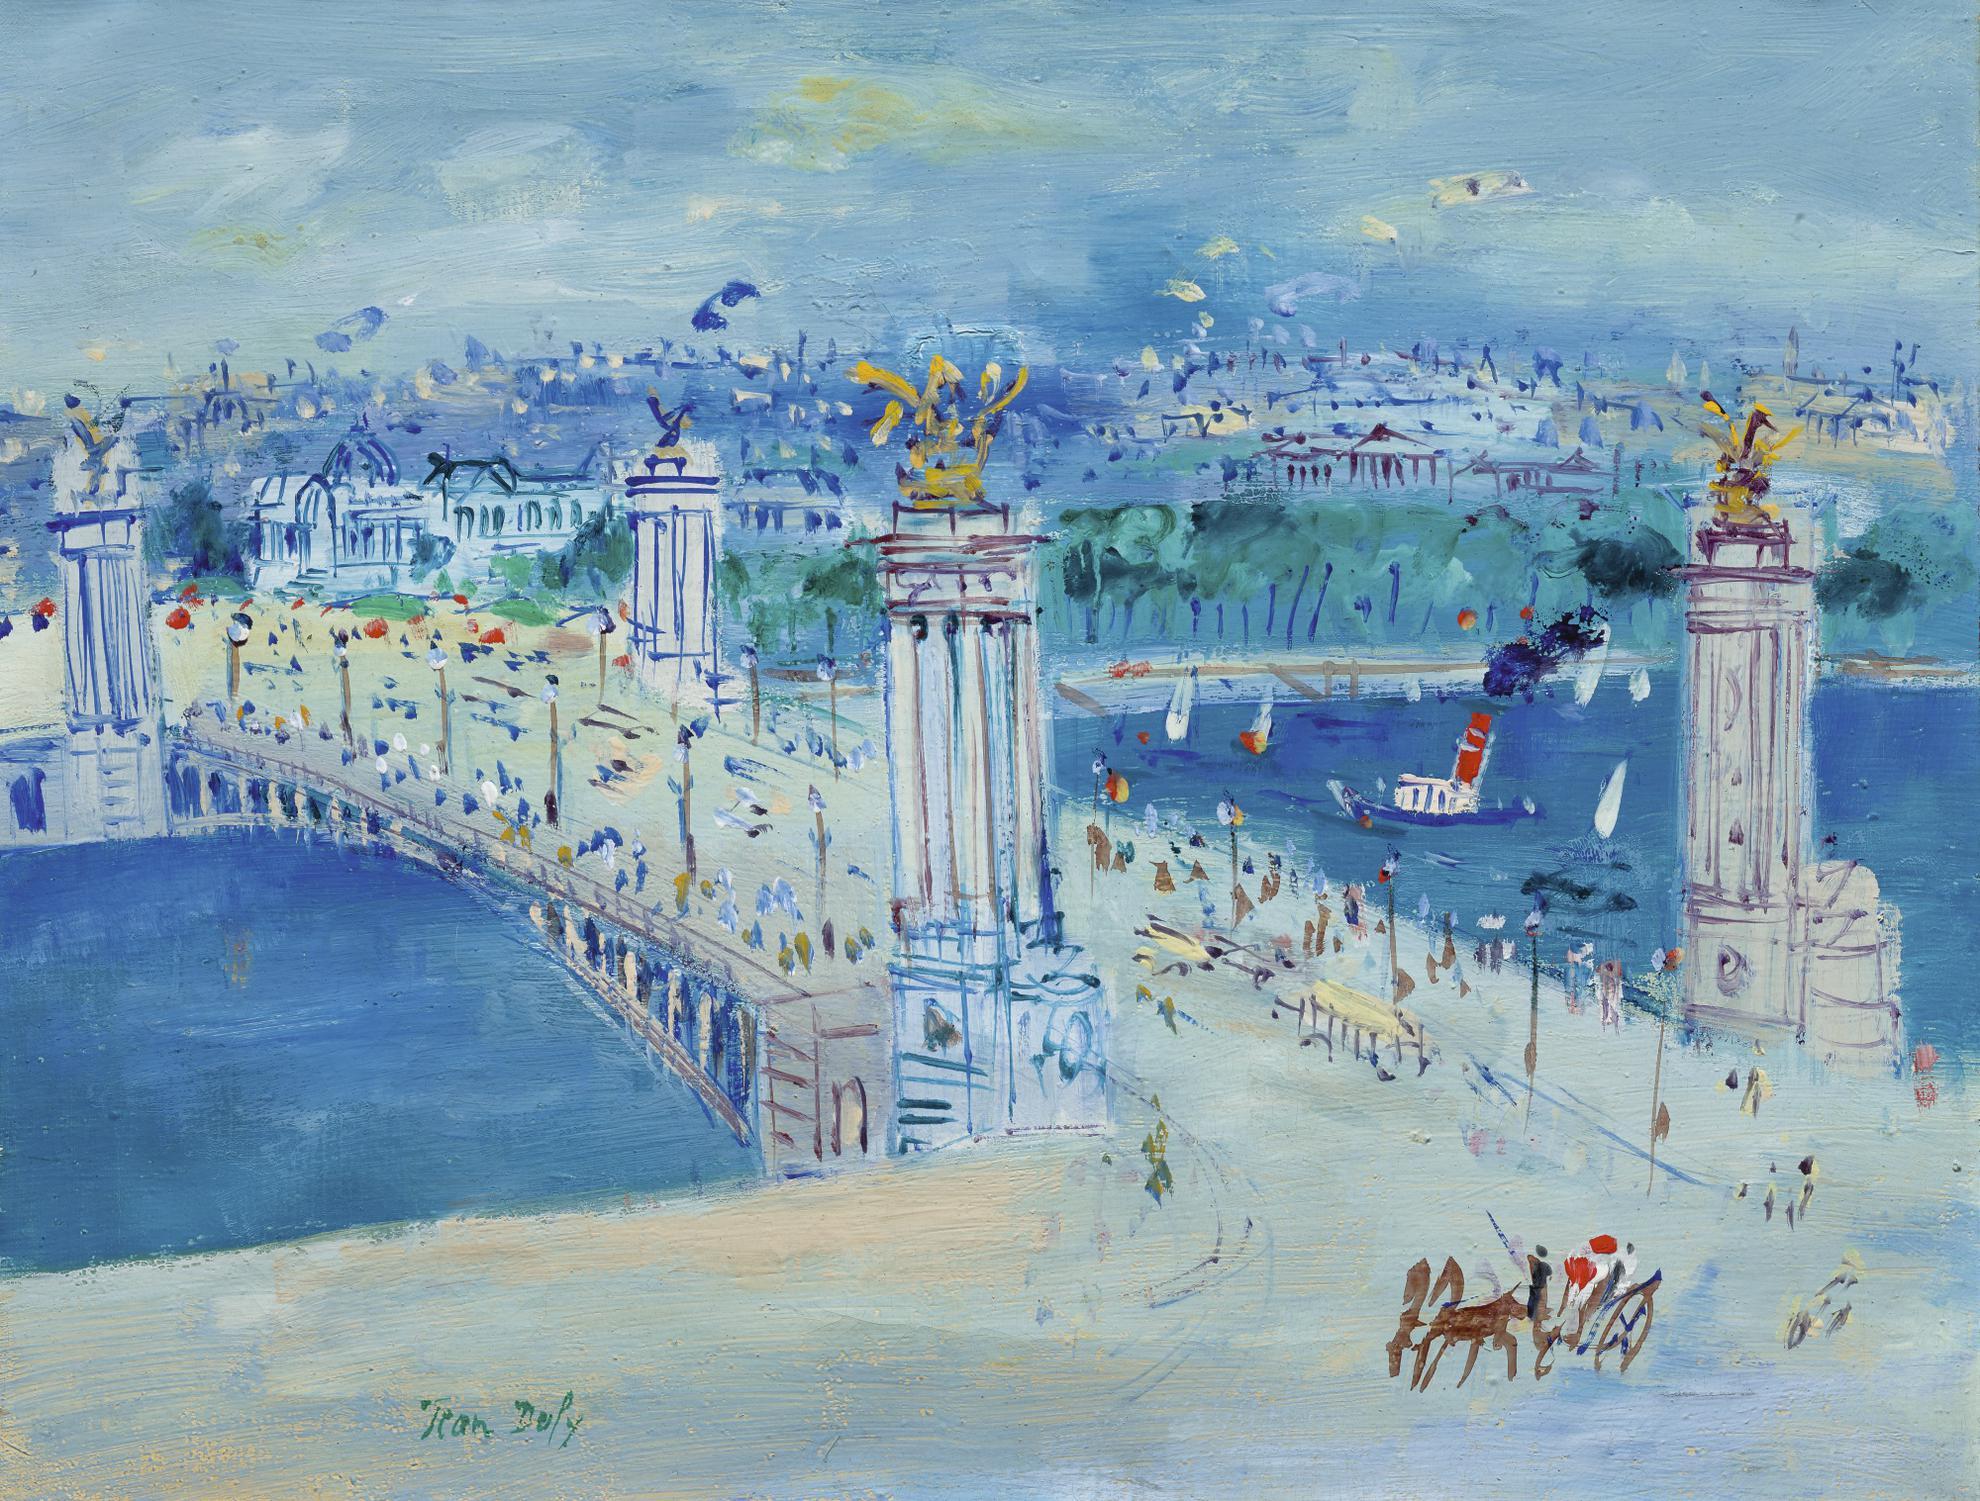 Jean Dufy-Pont Alexandre III, Paris-